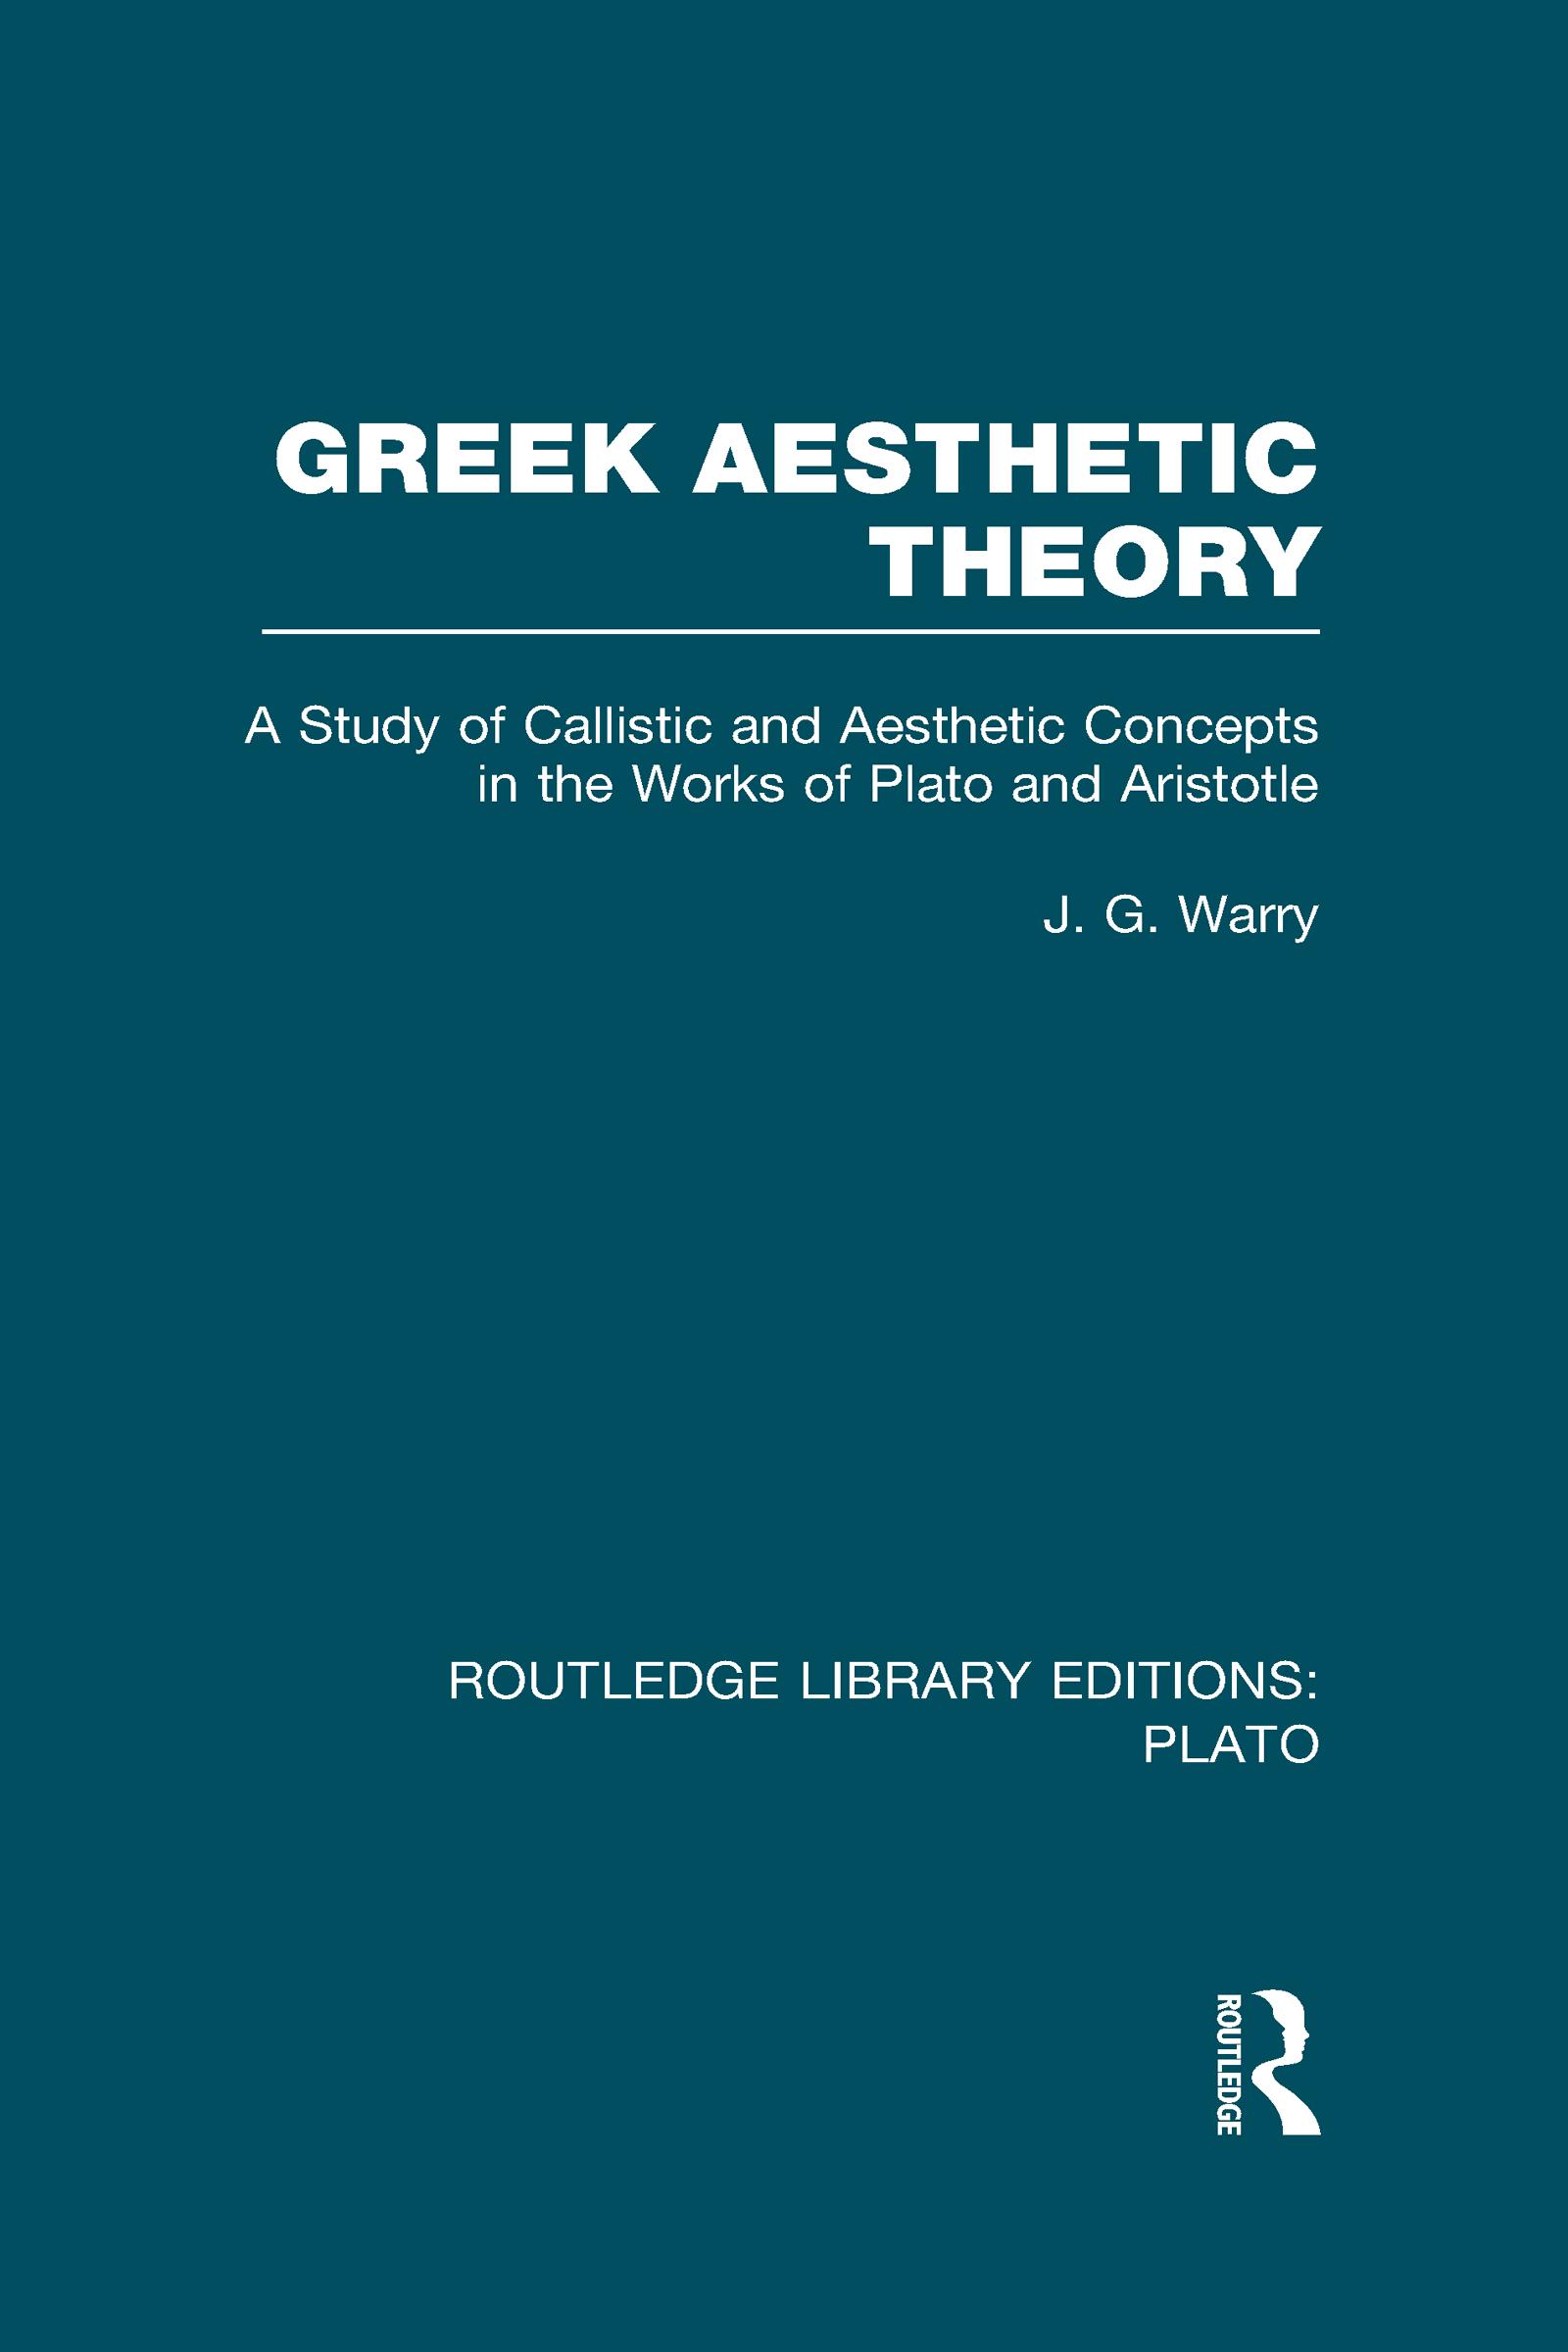 Greek Aesthetic Theory (RLE: Plato) (Hardback) book cover